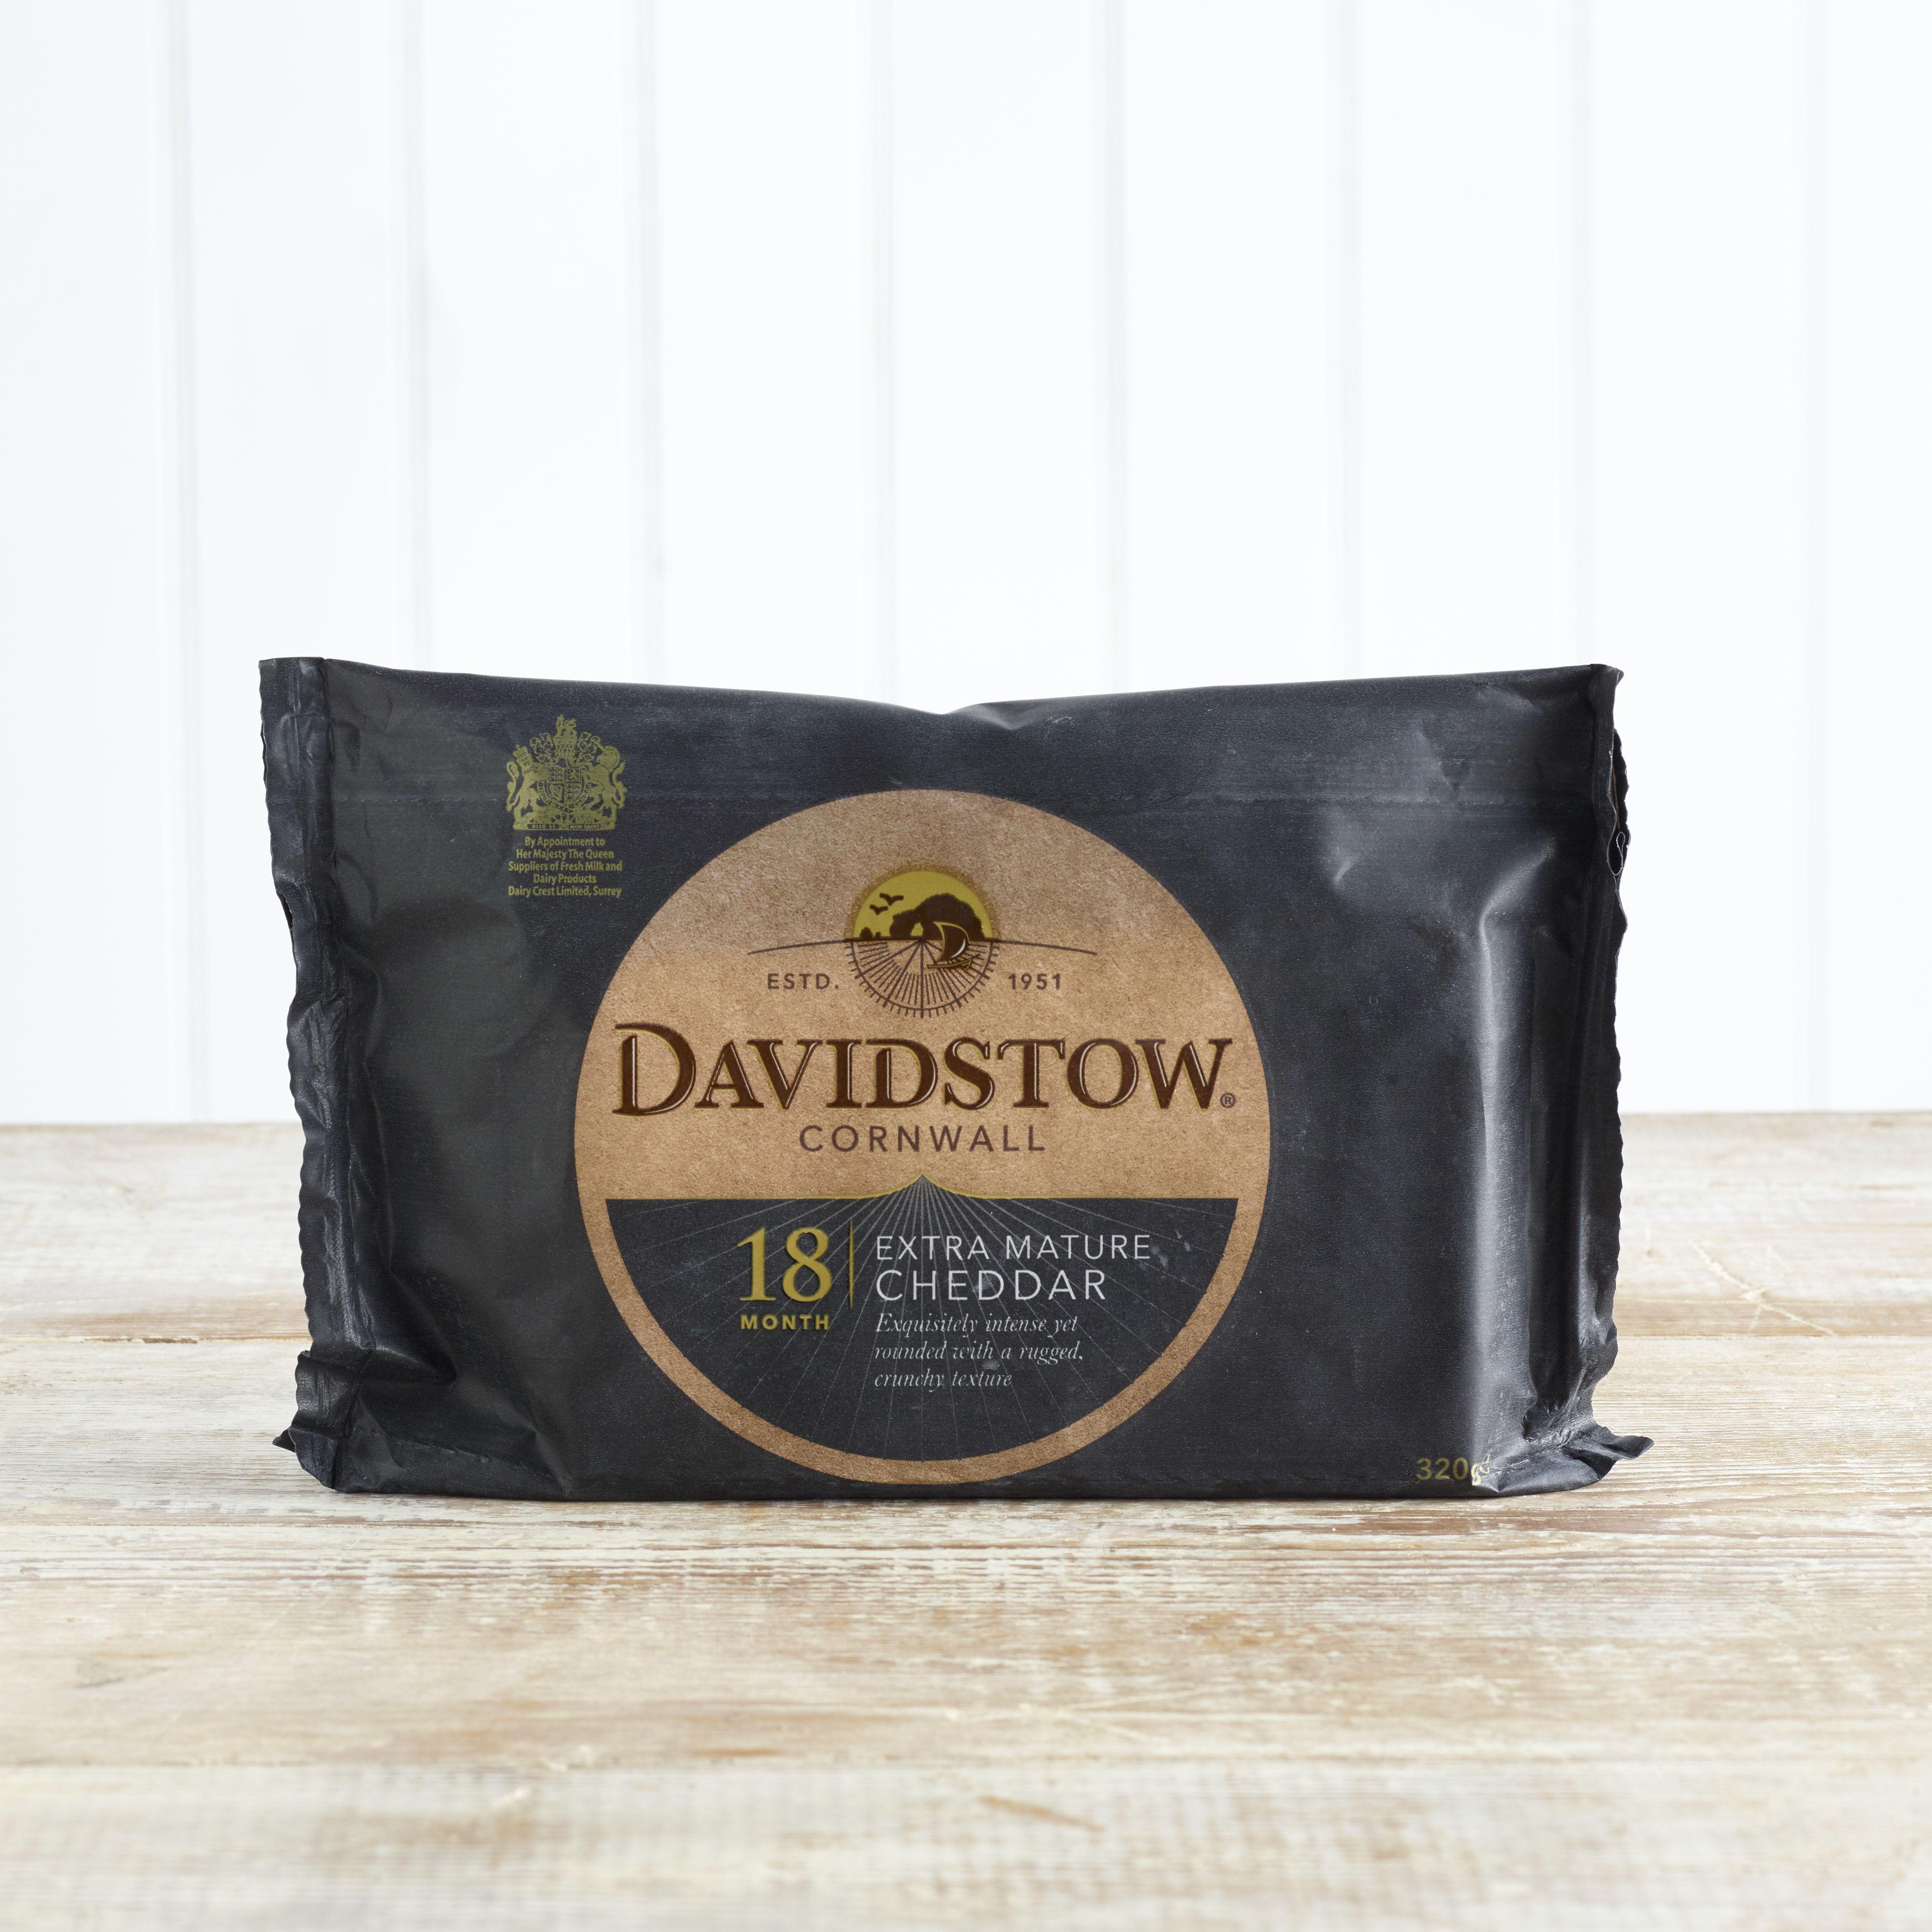 Davidstow Extra Mature Cornish Crackler Cheddar, 320g